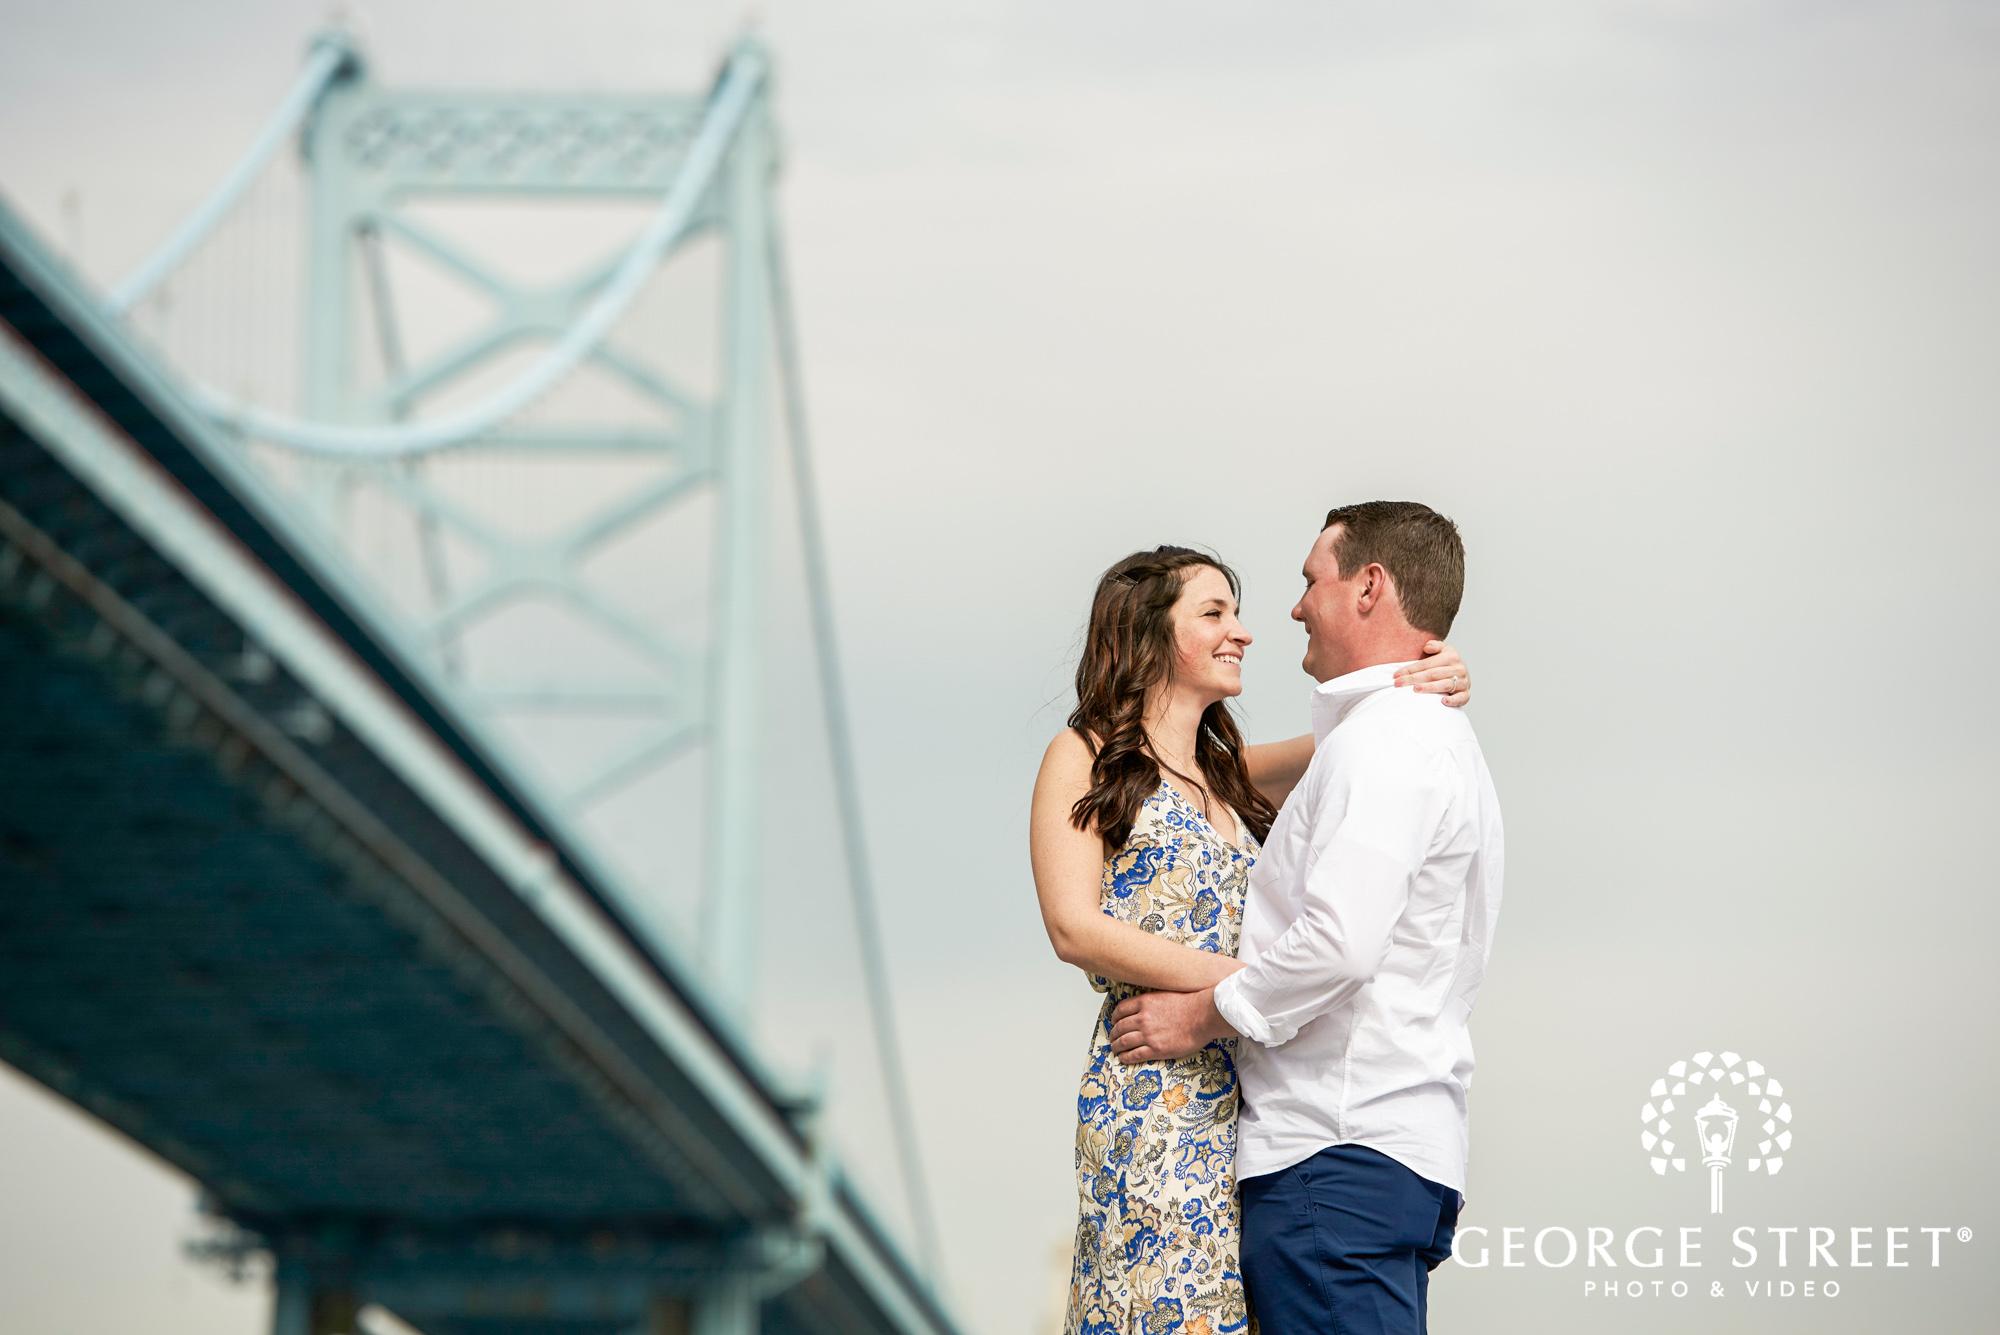 philadelphia engagement photos by the benjamin franklin bridge 3